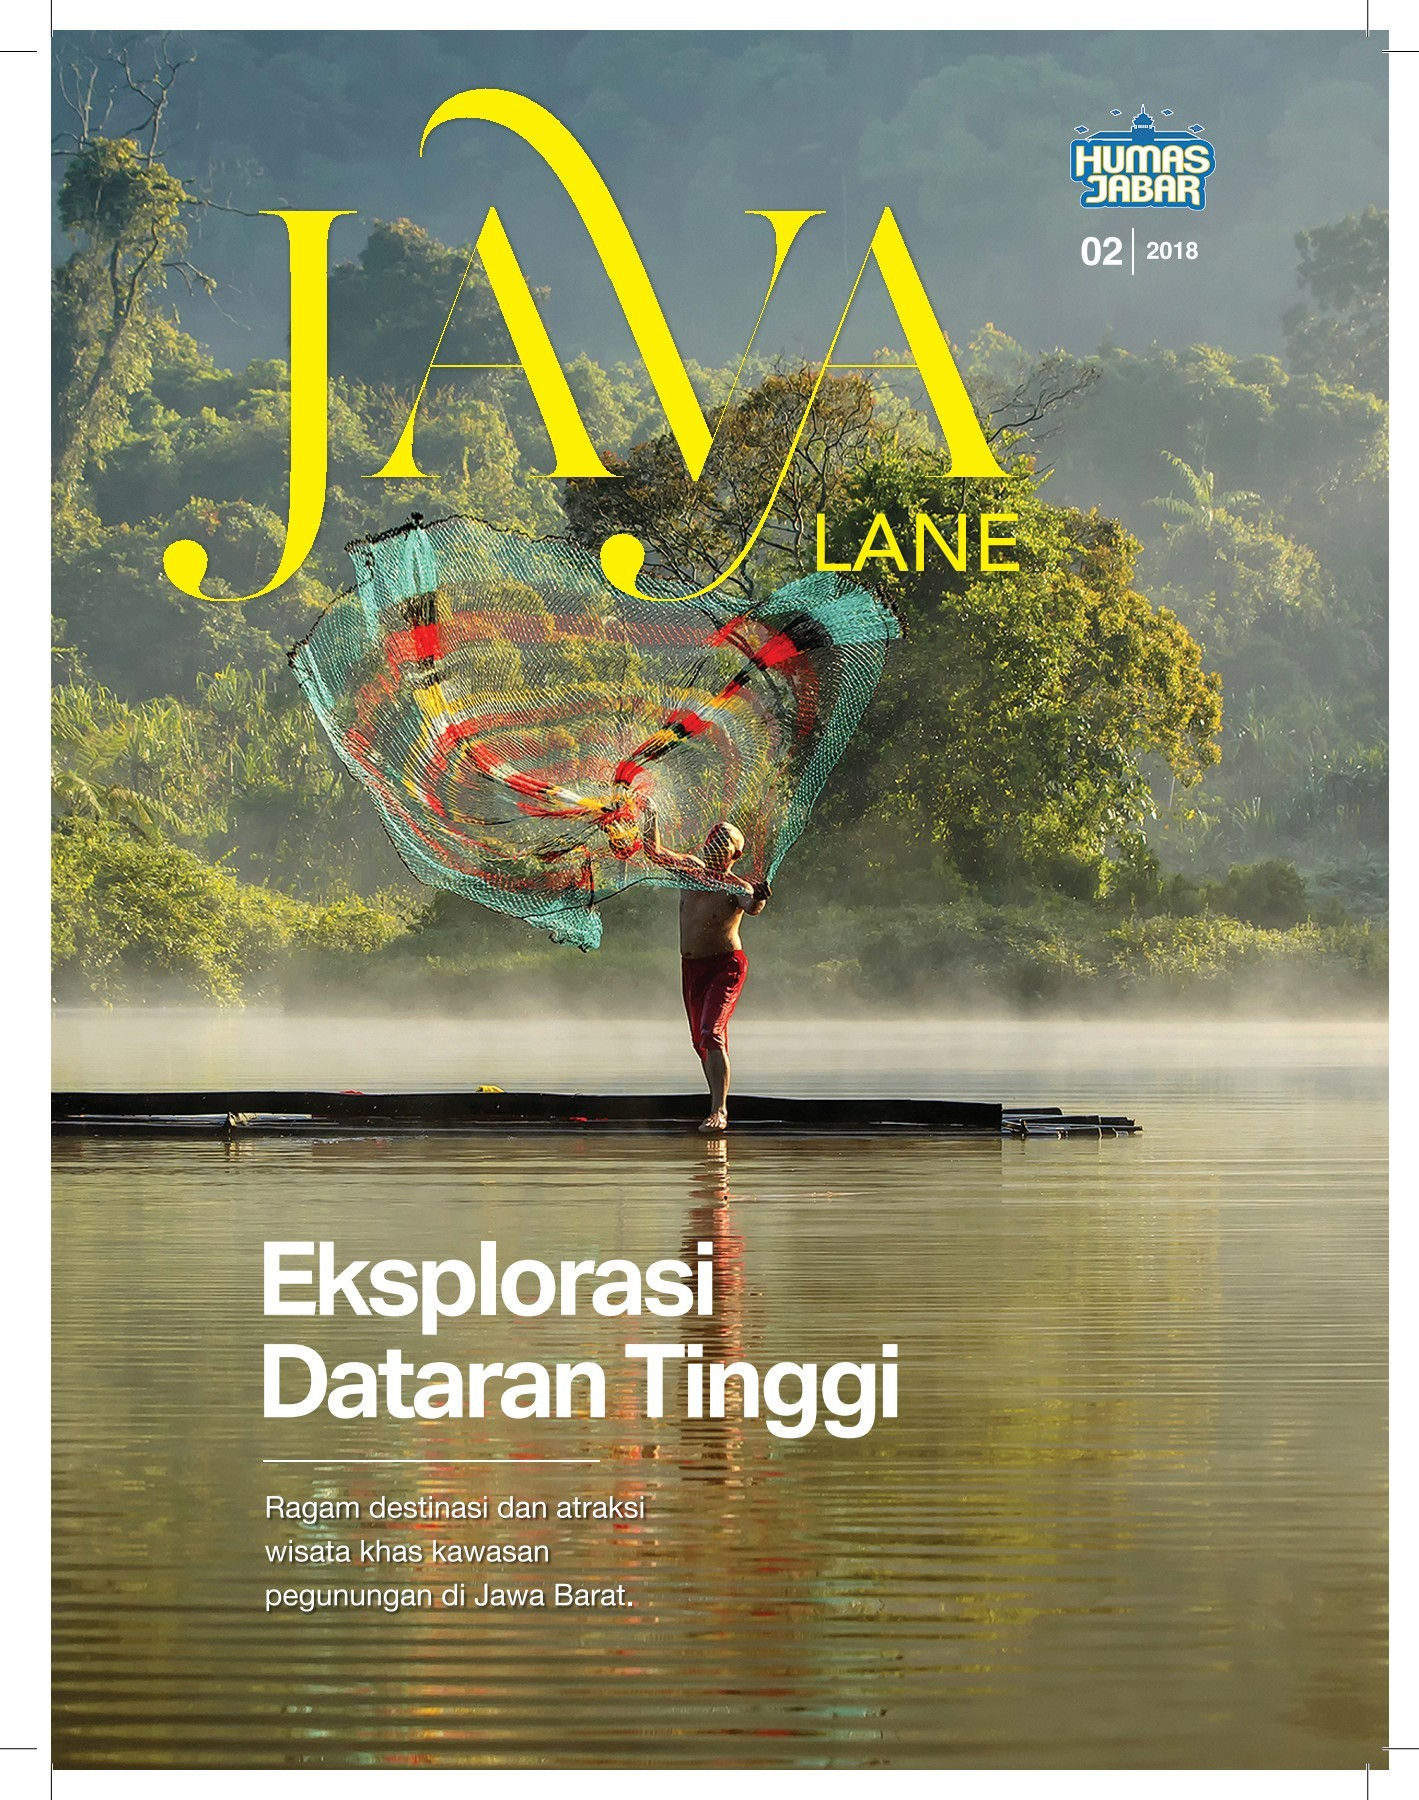 Javalane Edisi 2 Flip Book Pages 1 50